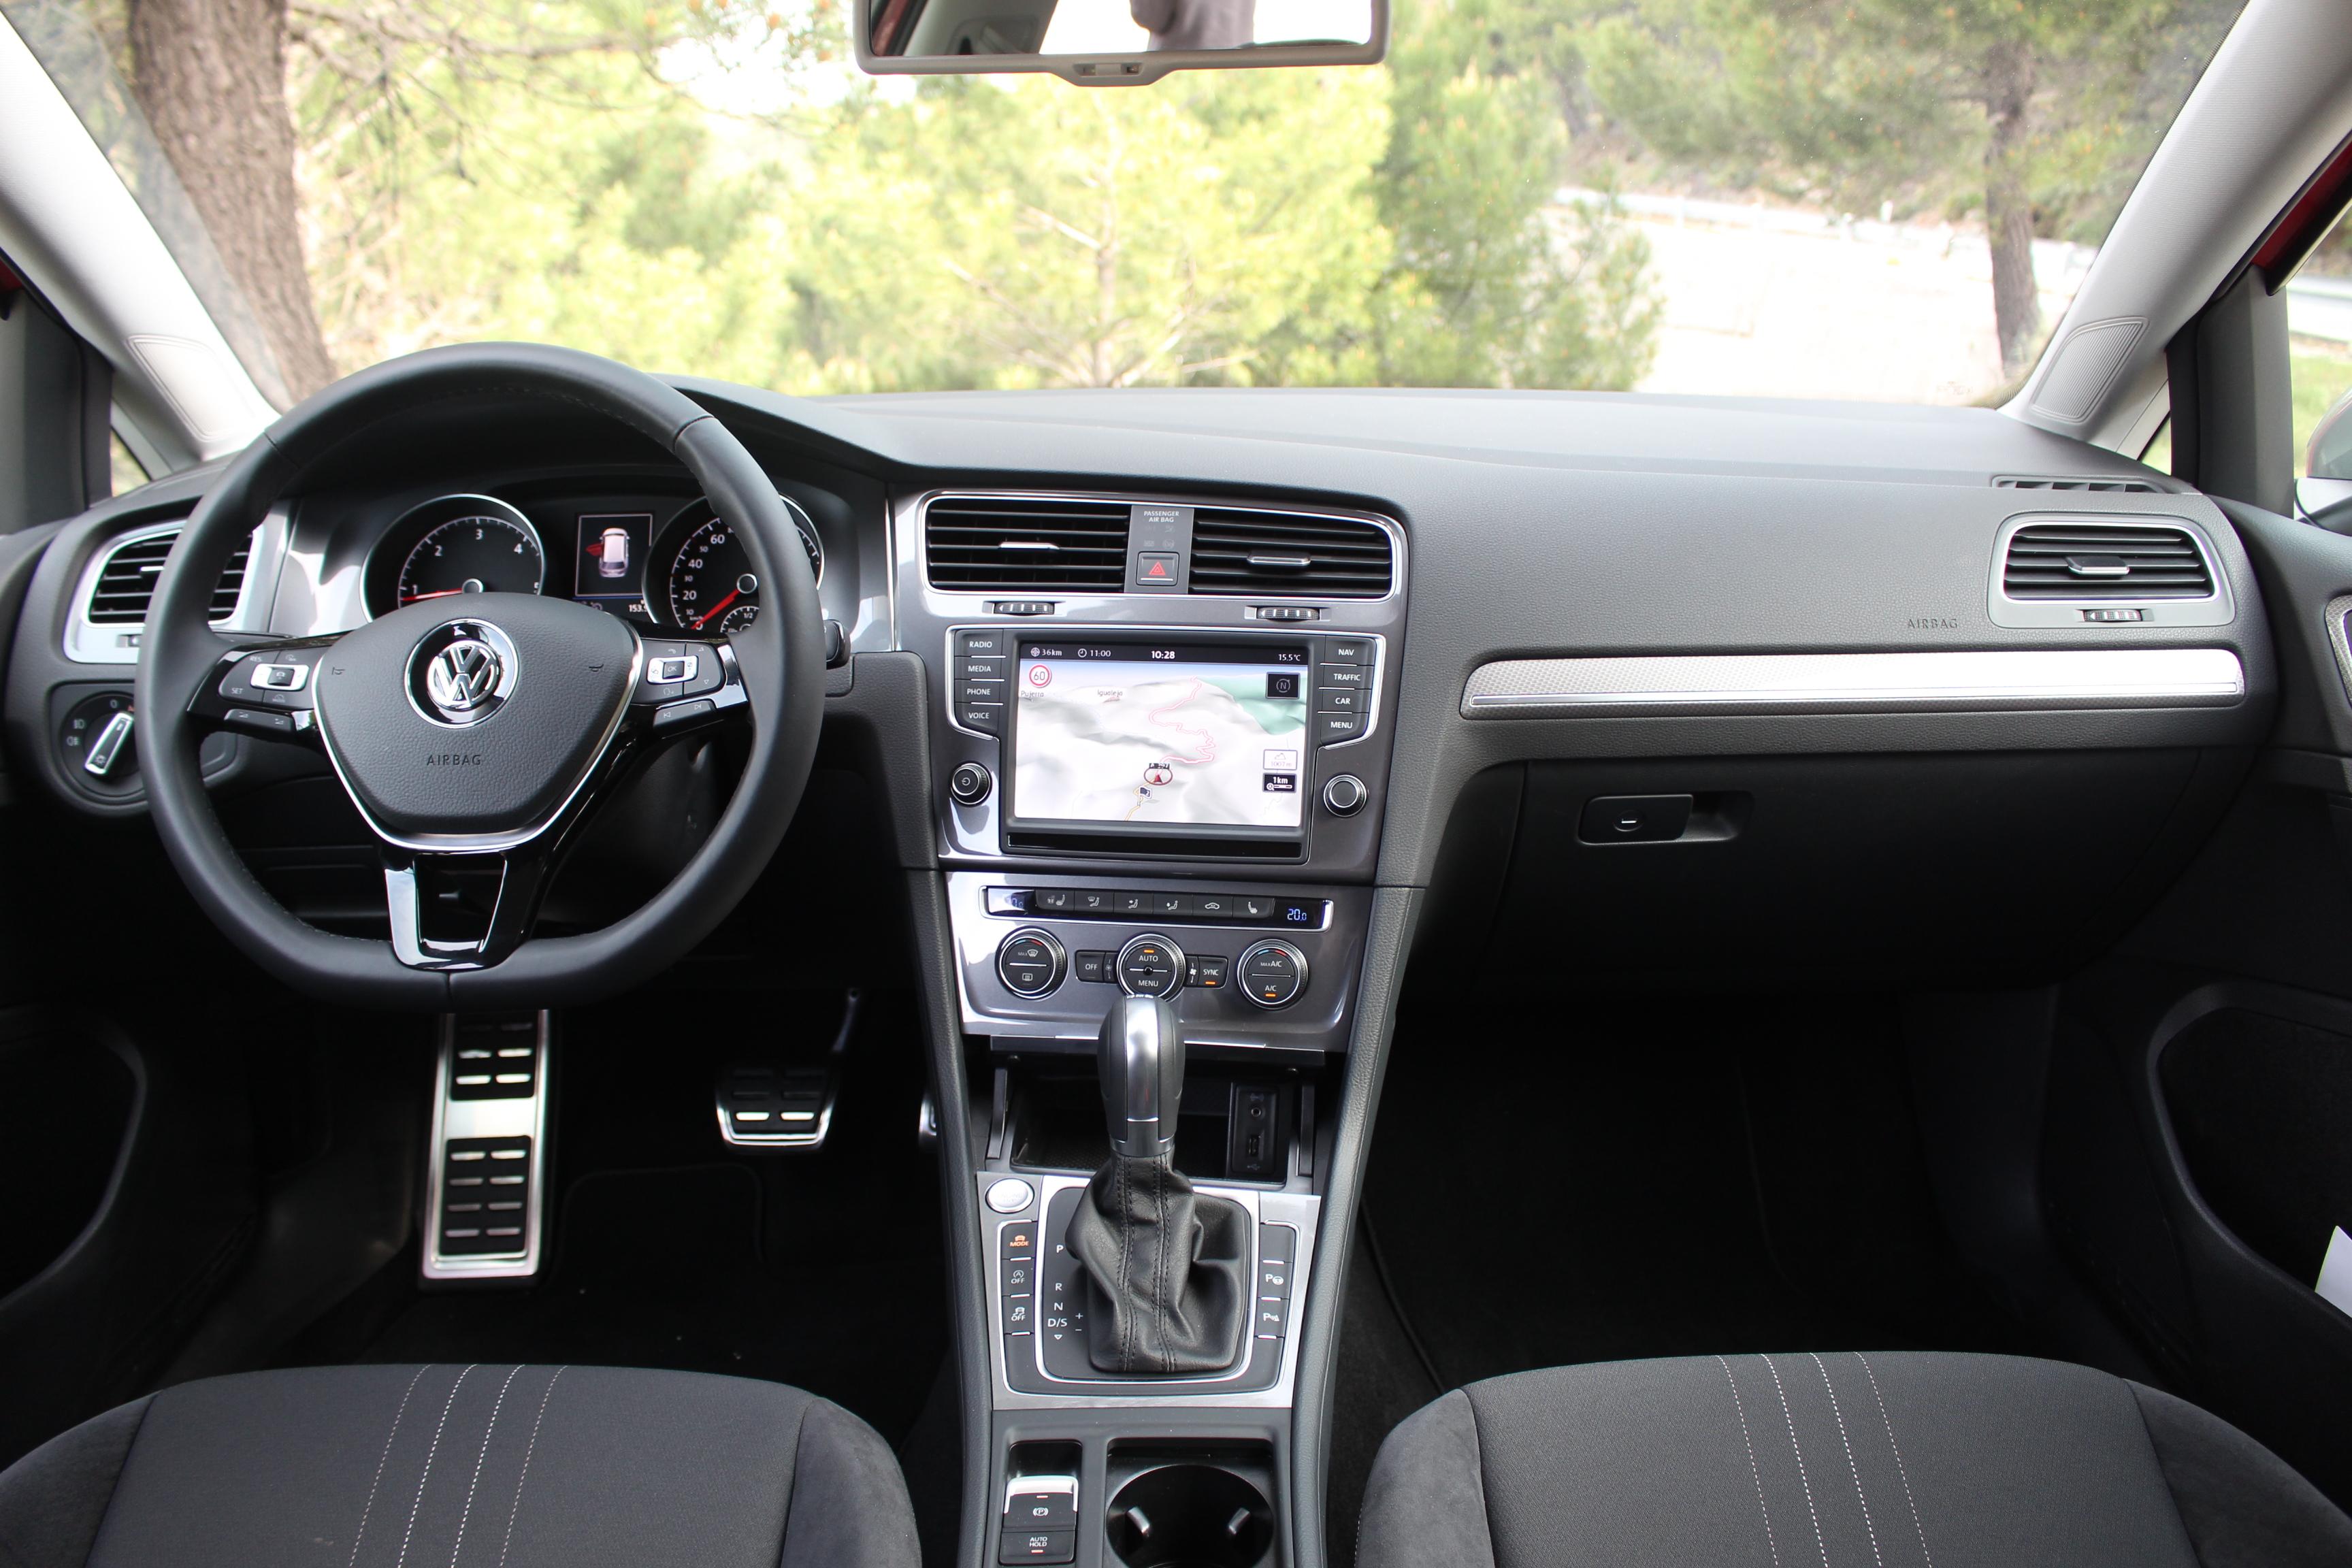 Essai vid o volkswagen golf alltrack star trek for Volkswagen golf 6 interieur